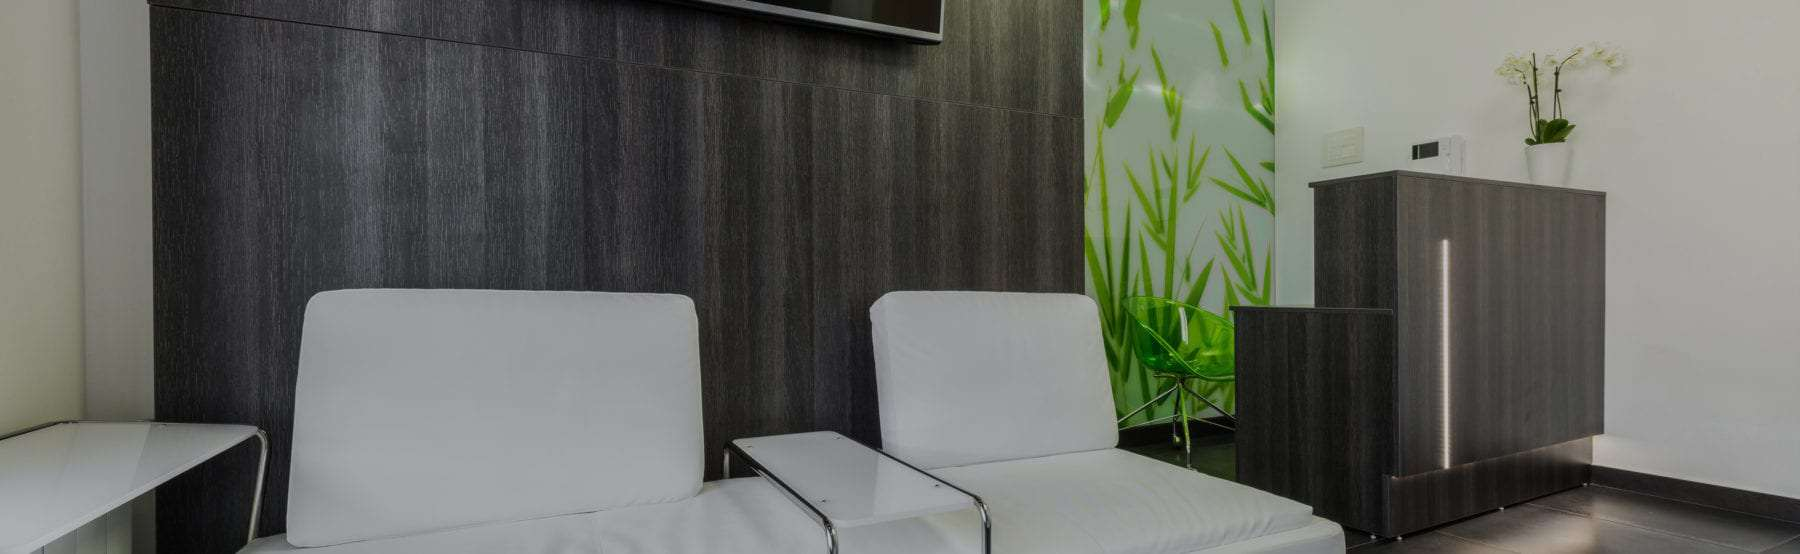 healthcare-interior-design-art